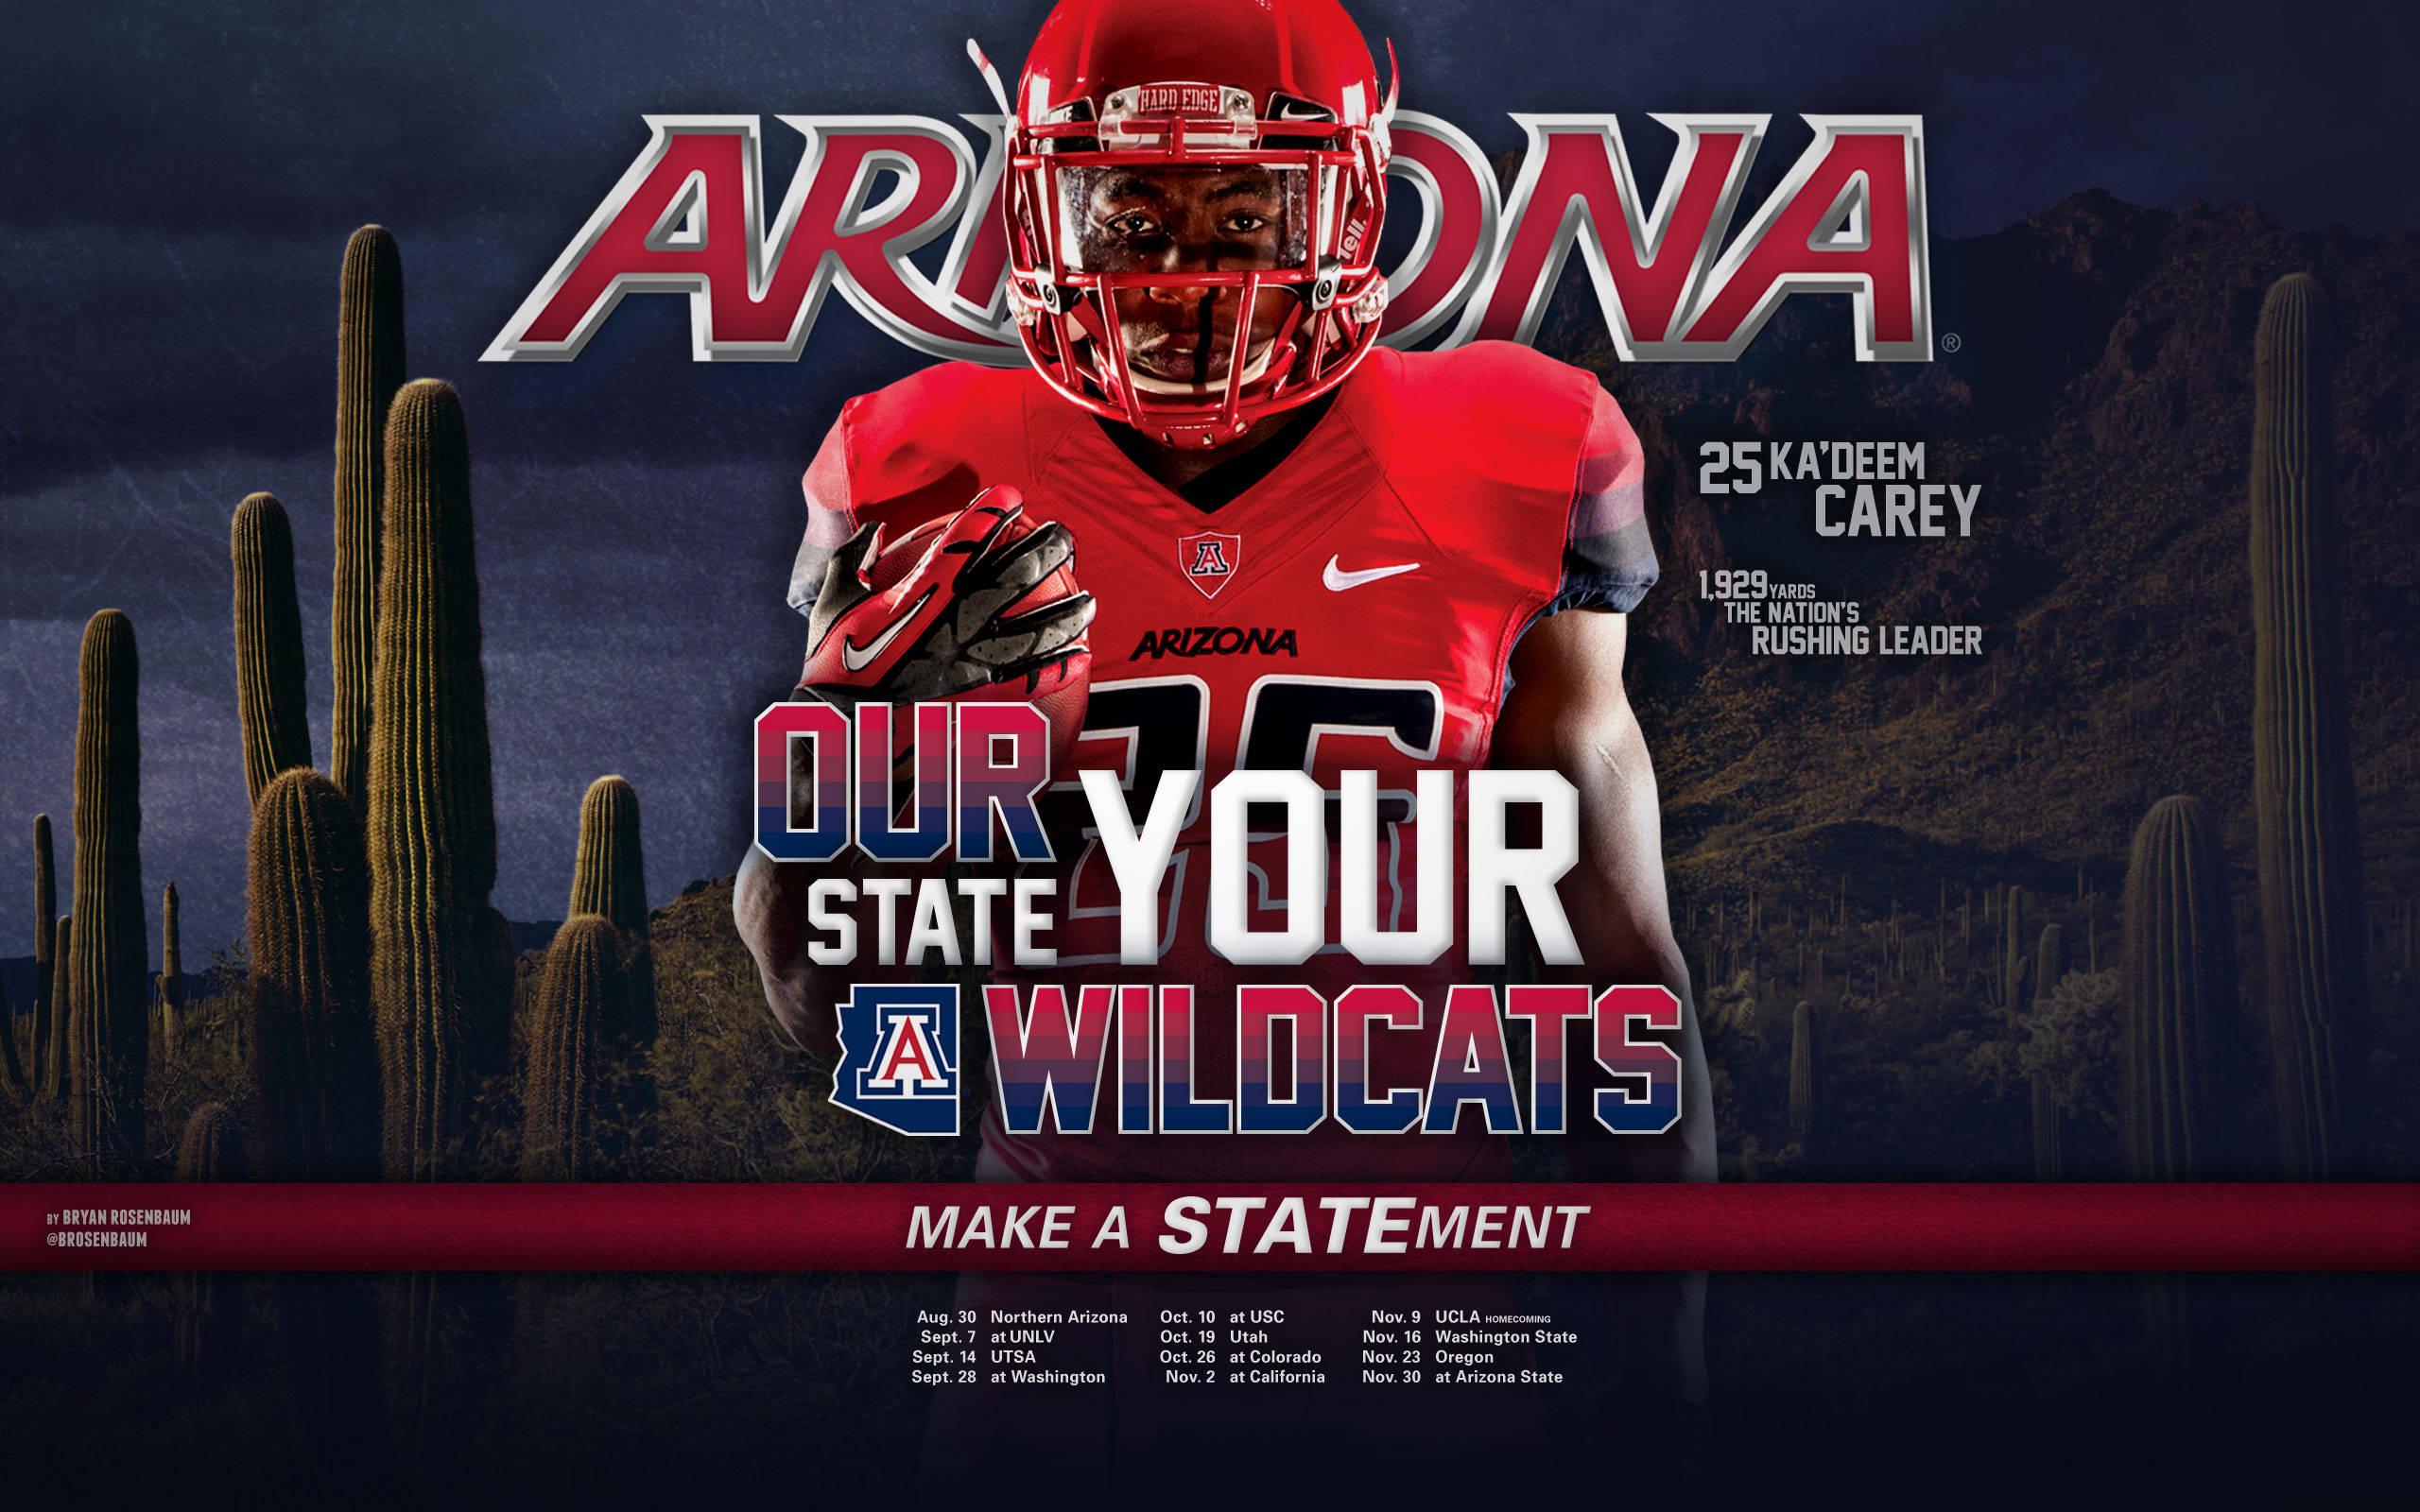 University of Arizona Wildcats Wallpaper - WallpaperSafari